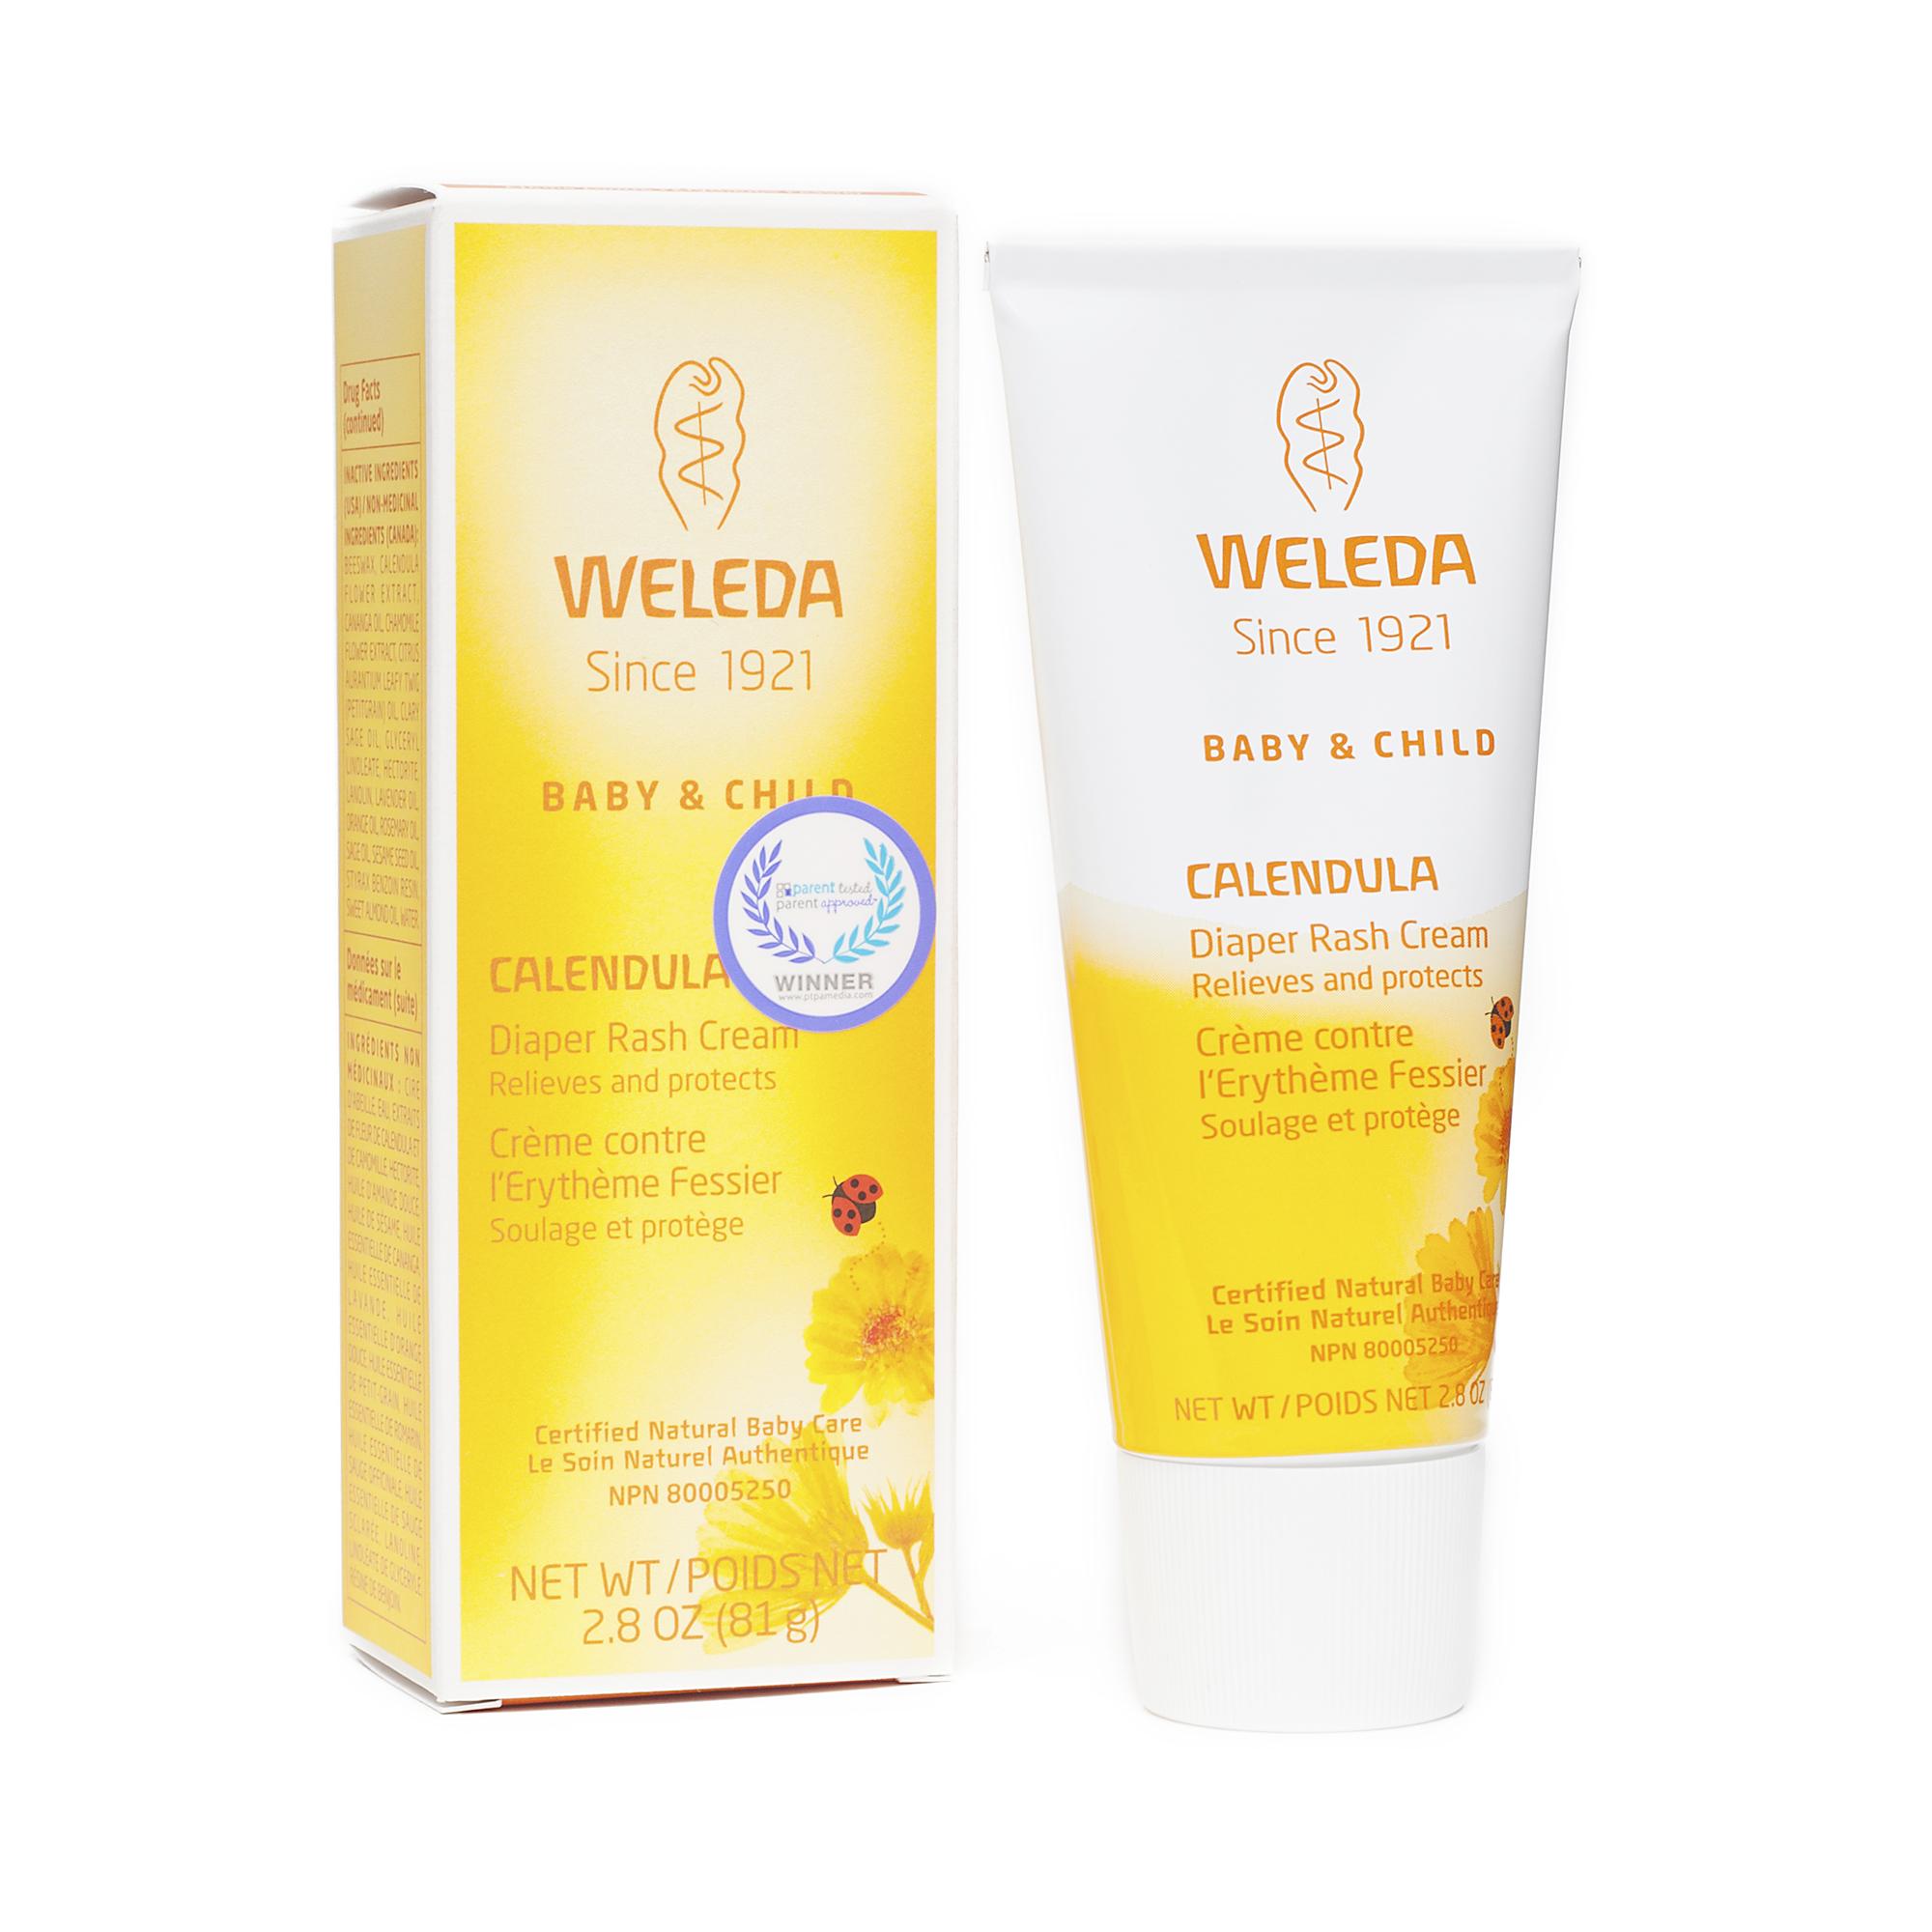 Weleda Calendula Diaper Rash Cream